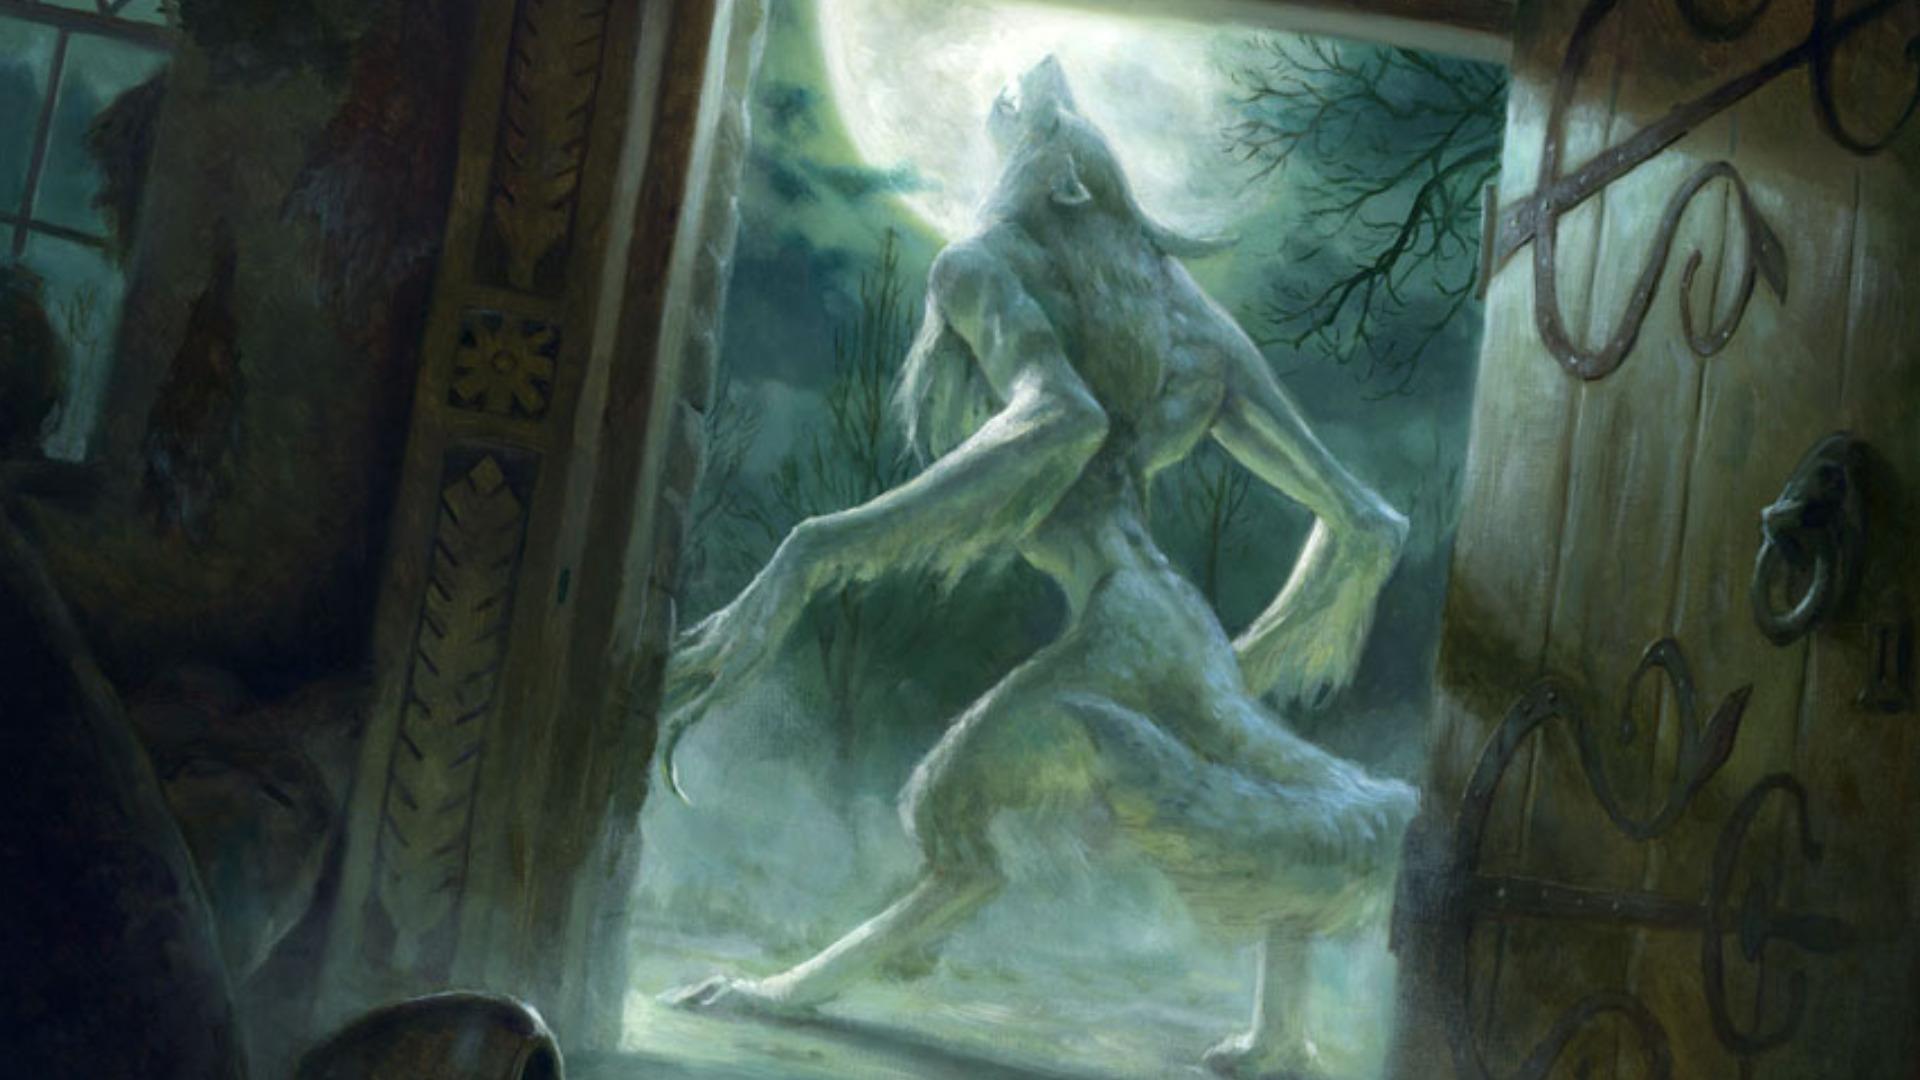 Gothic Vampire Girl Wallpaper Free Download Werewolf Wallpapers Pixelstalk Net